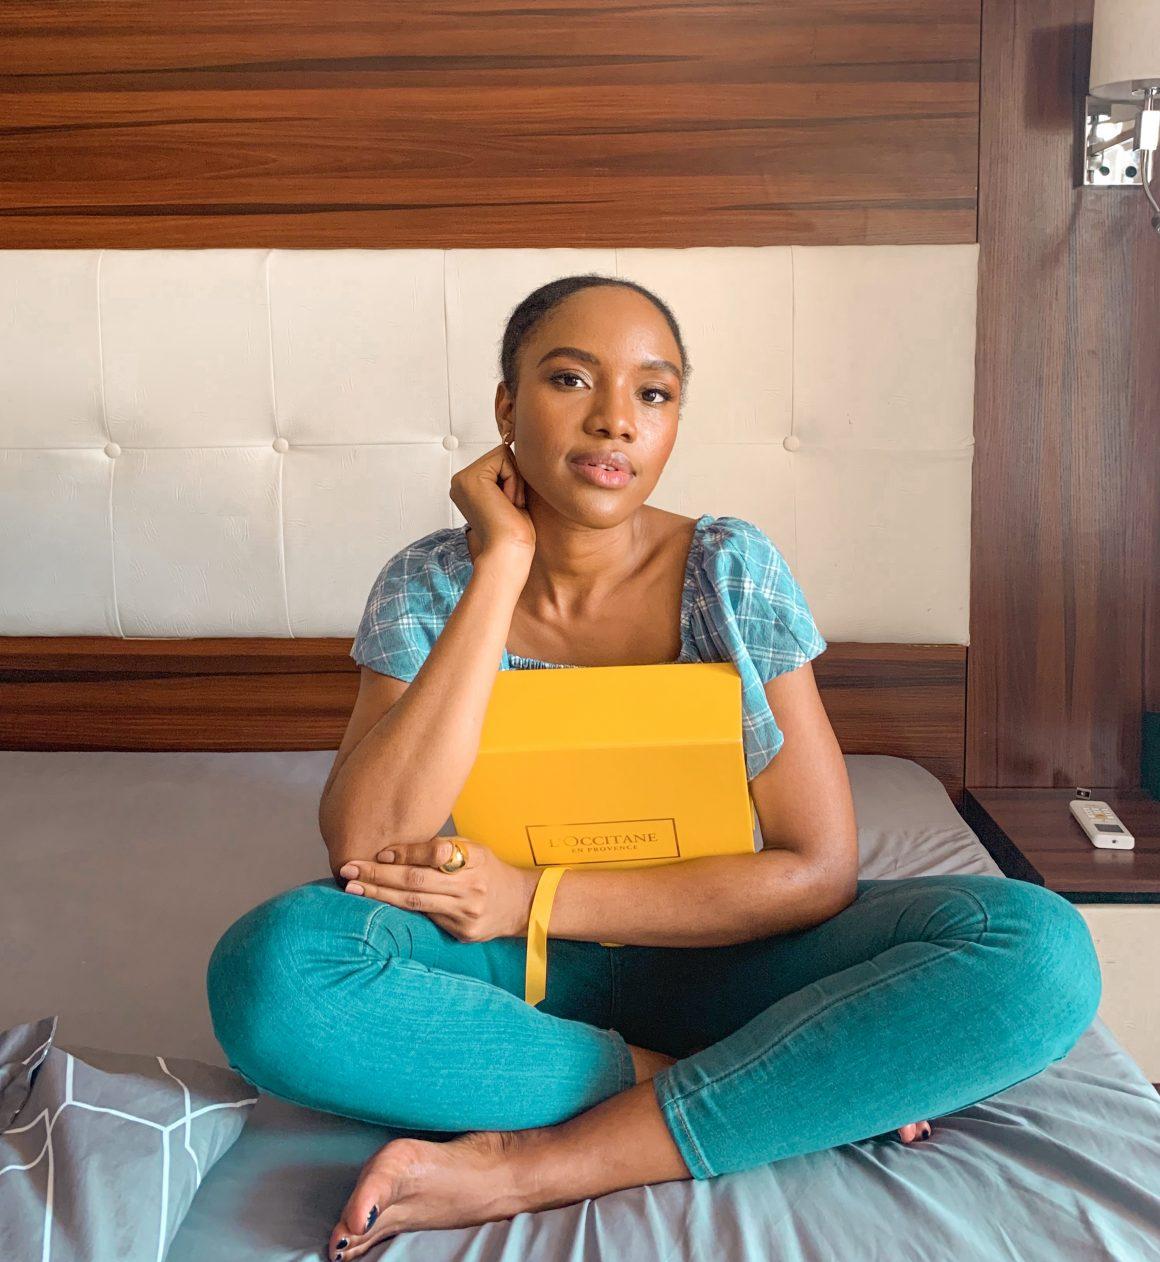 Unboxing & First Impressions: L'occitane Nigeria